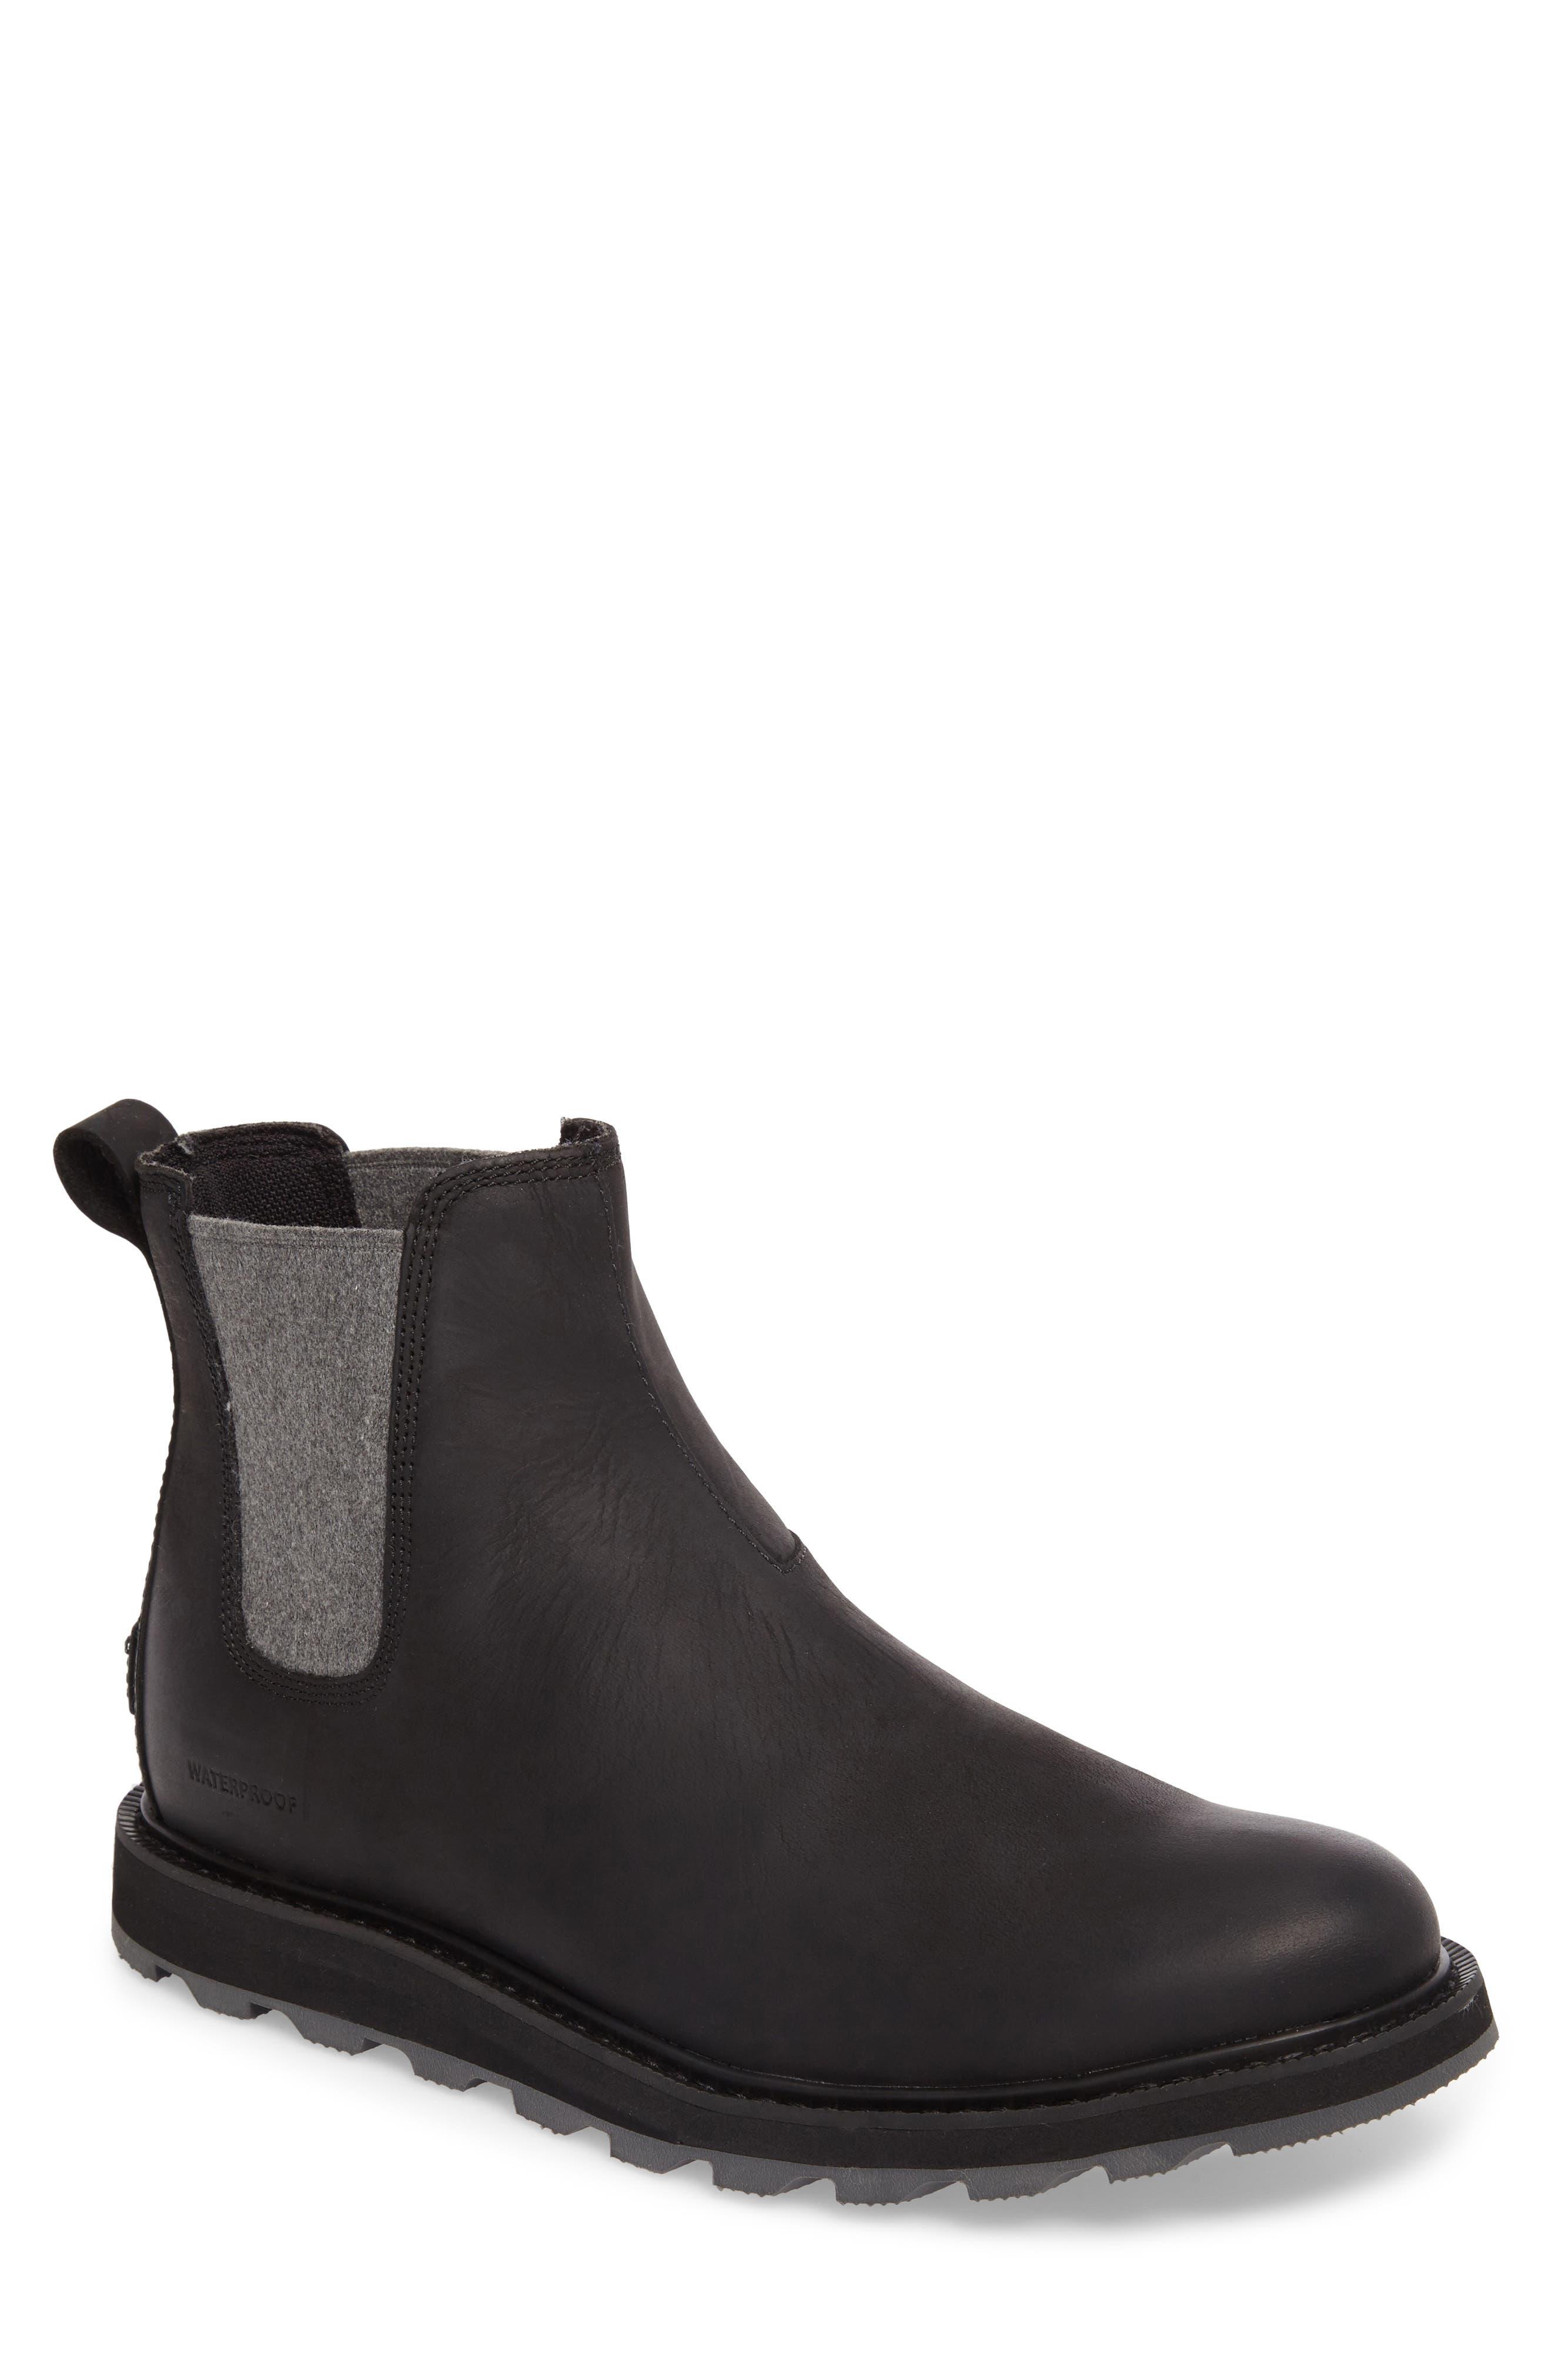 Madson Waterproof Chelsea Boot,                             Main thumbnail 1, color,                             Black